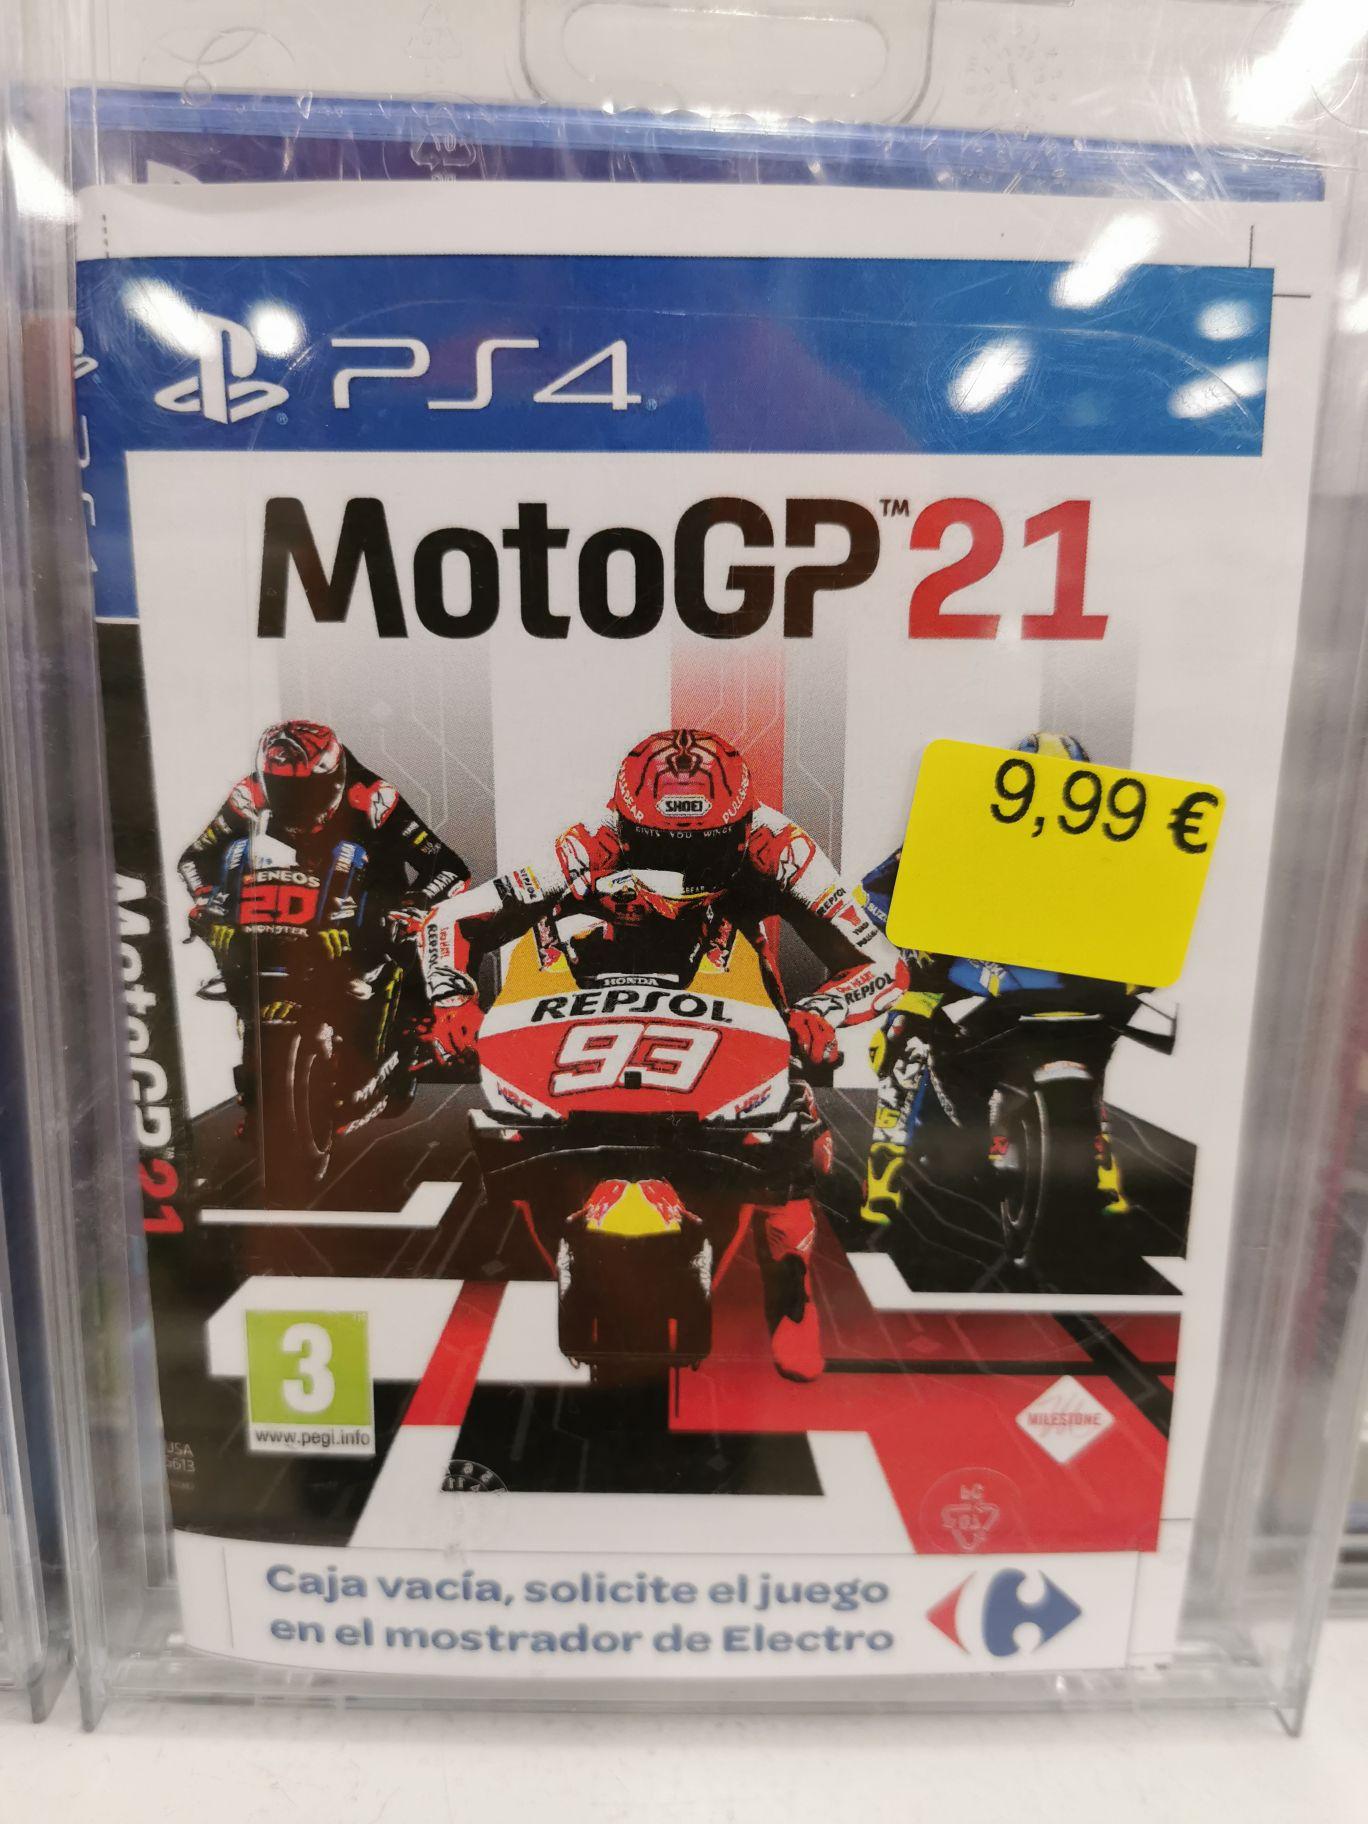 MotoGP 21 PS4 Visto en Carrefour de Cullera (Valencia)